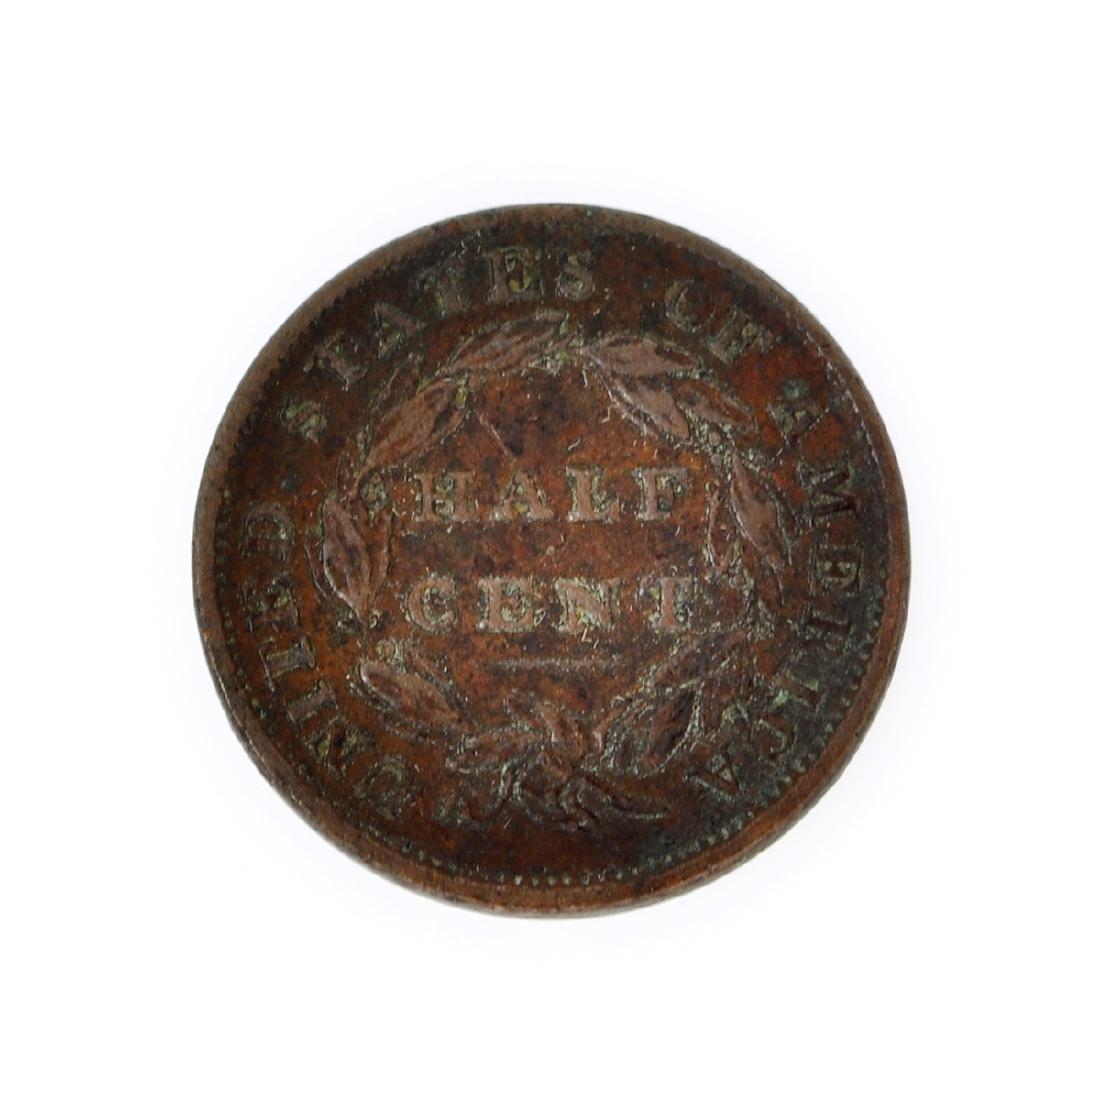 1833 Classic Head Half Cent Coin - 2